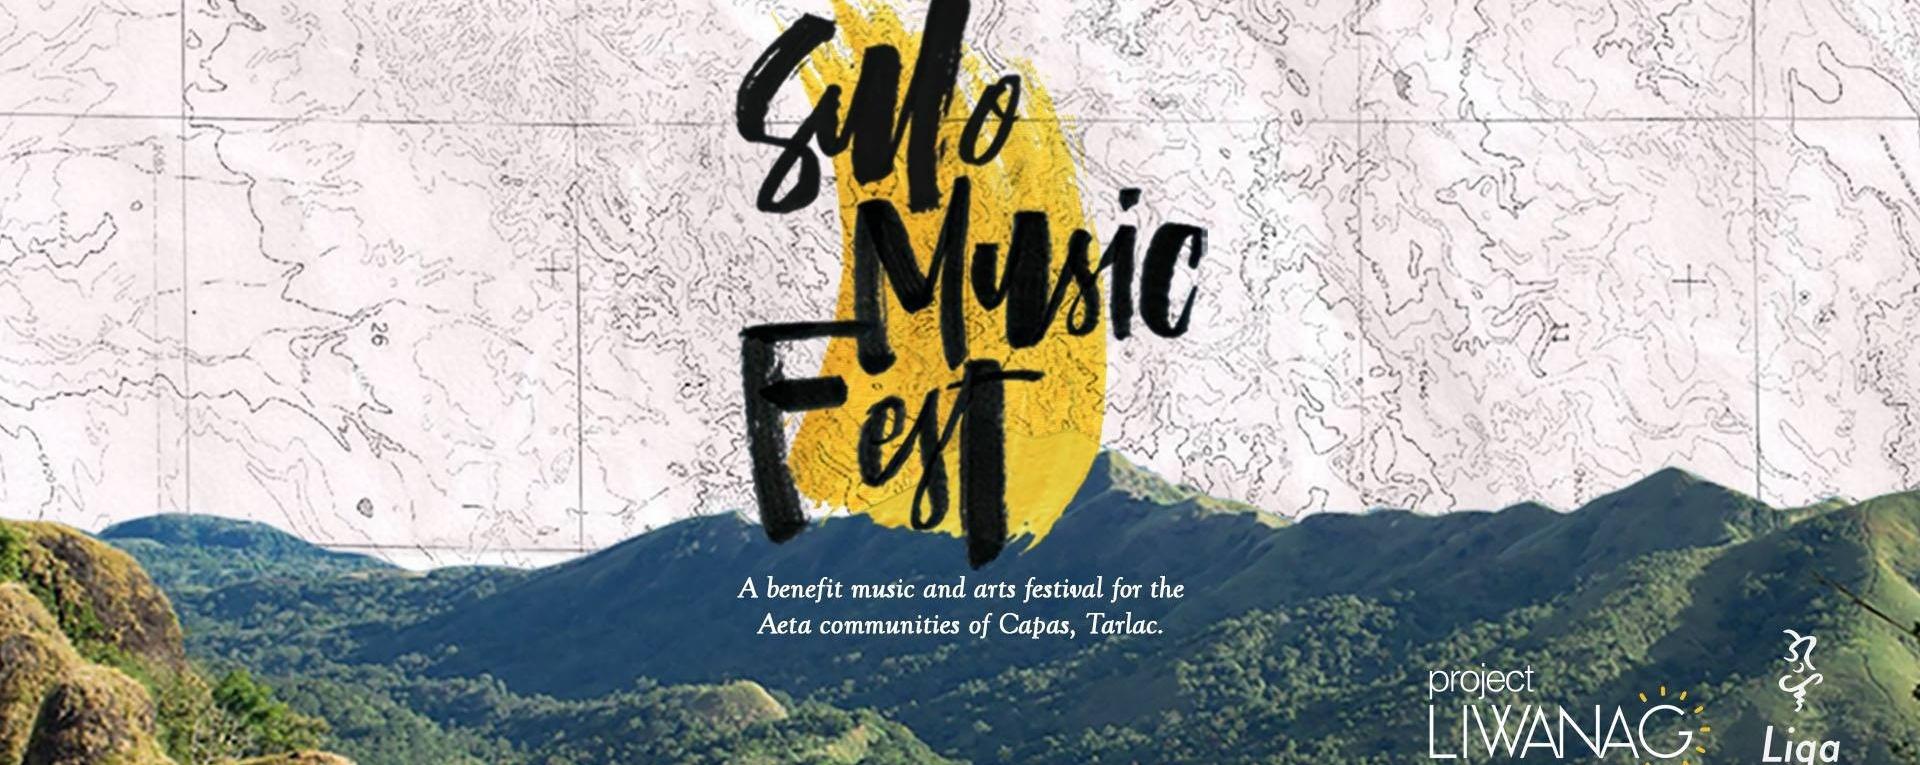 Sulo: A Benefit Music and Arts Festival